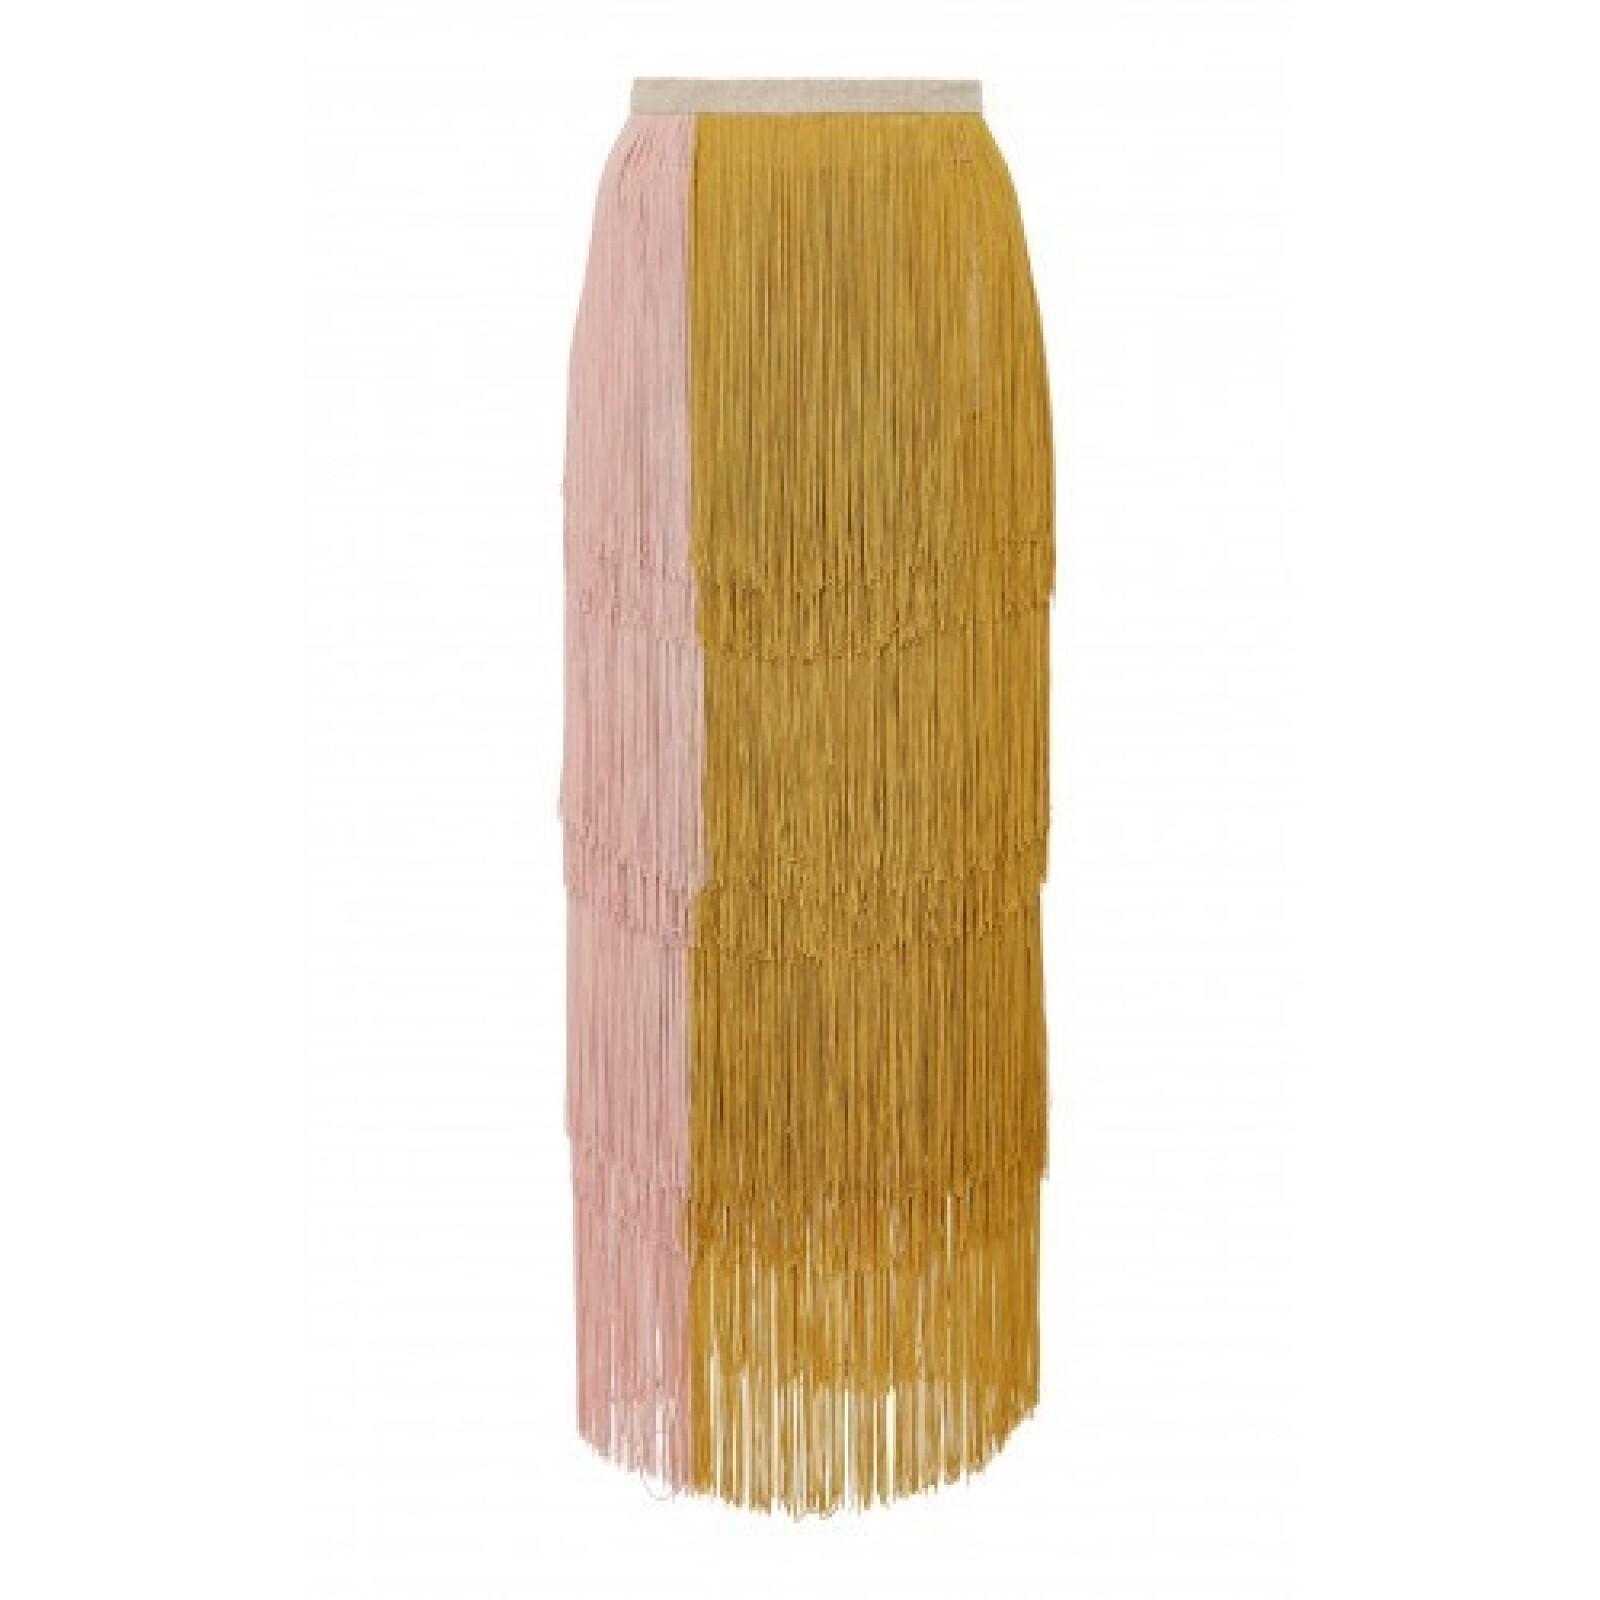 rachel-comey-gyre-fringed-linen-skirt-lbzbugg-100-linen-trim-100-rayon-product-c-3827-500x500_0